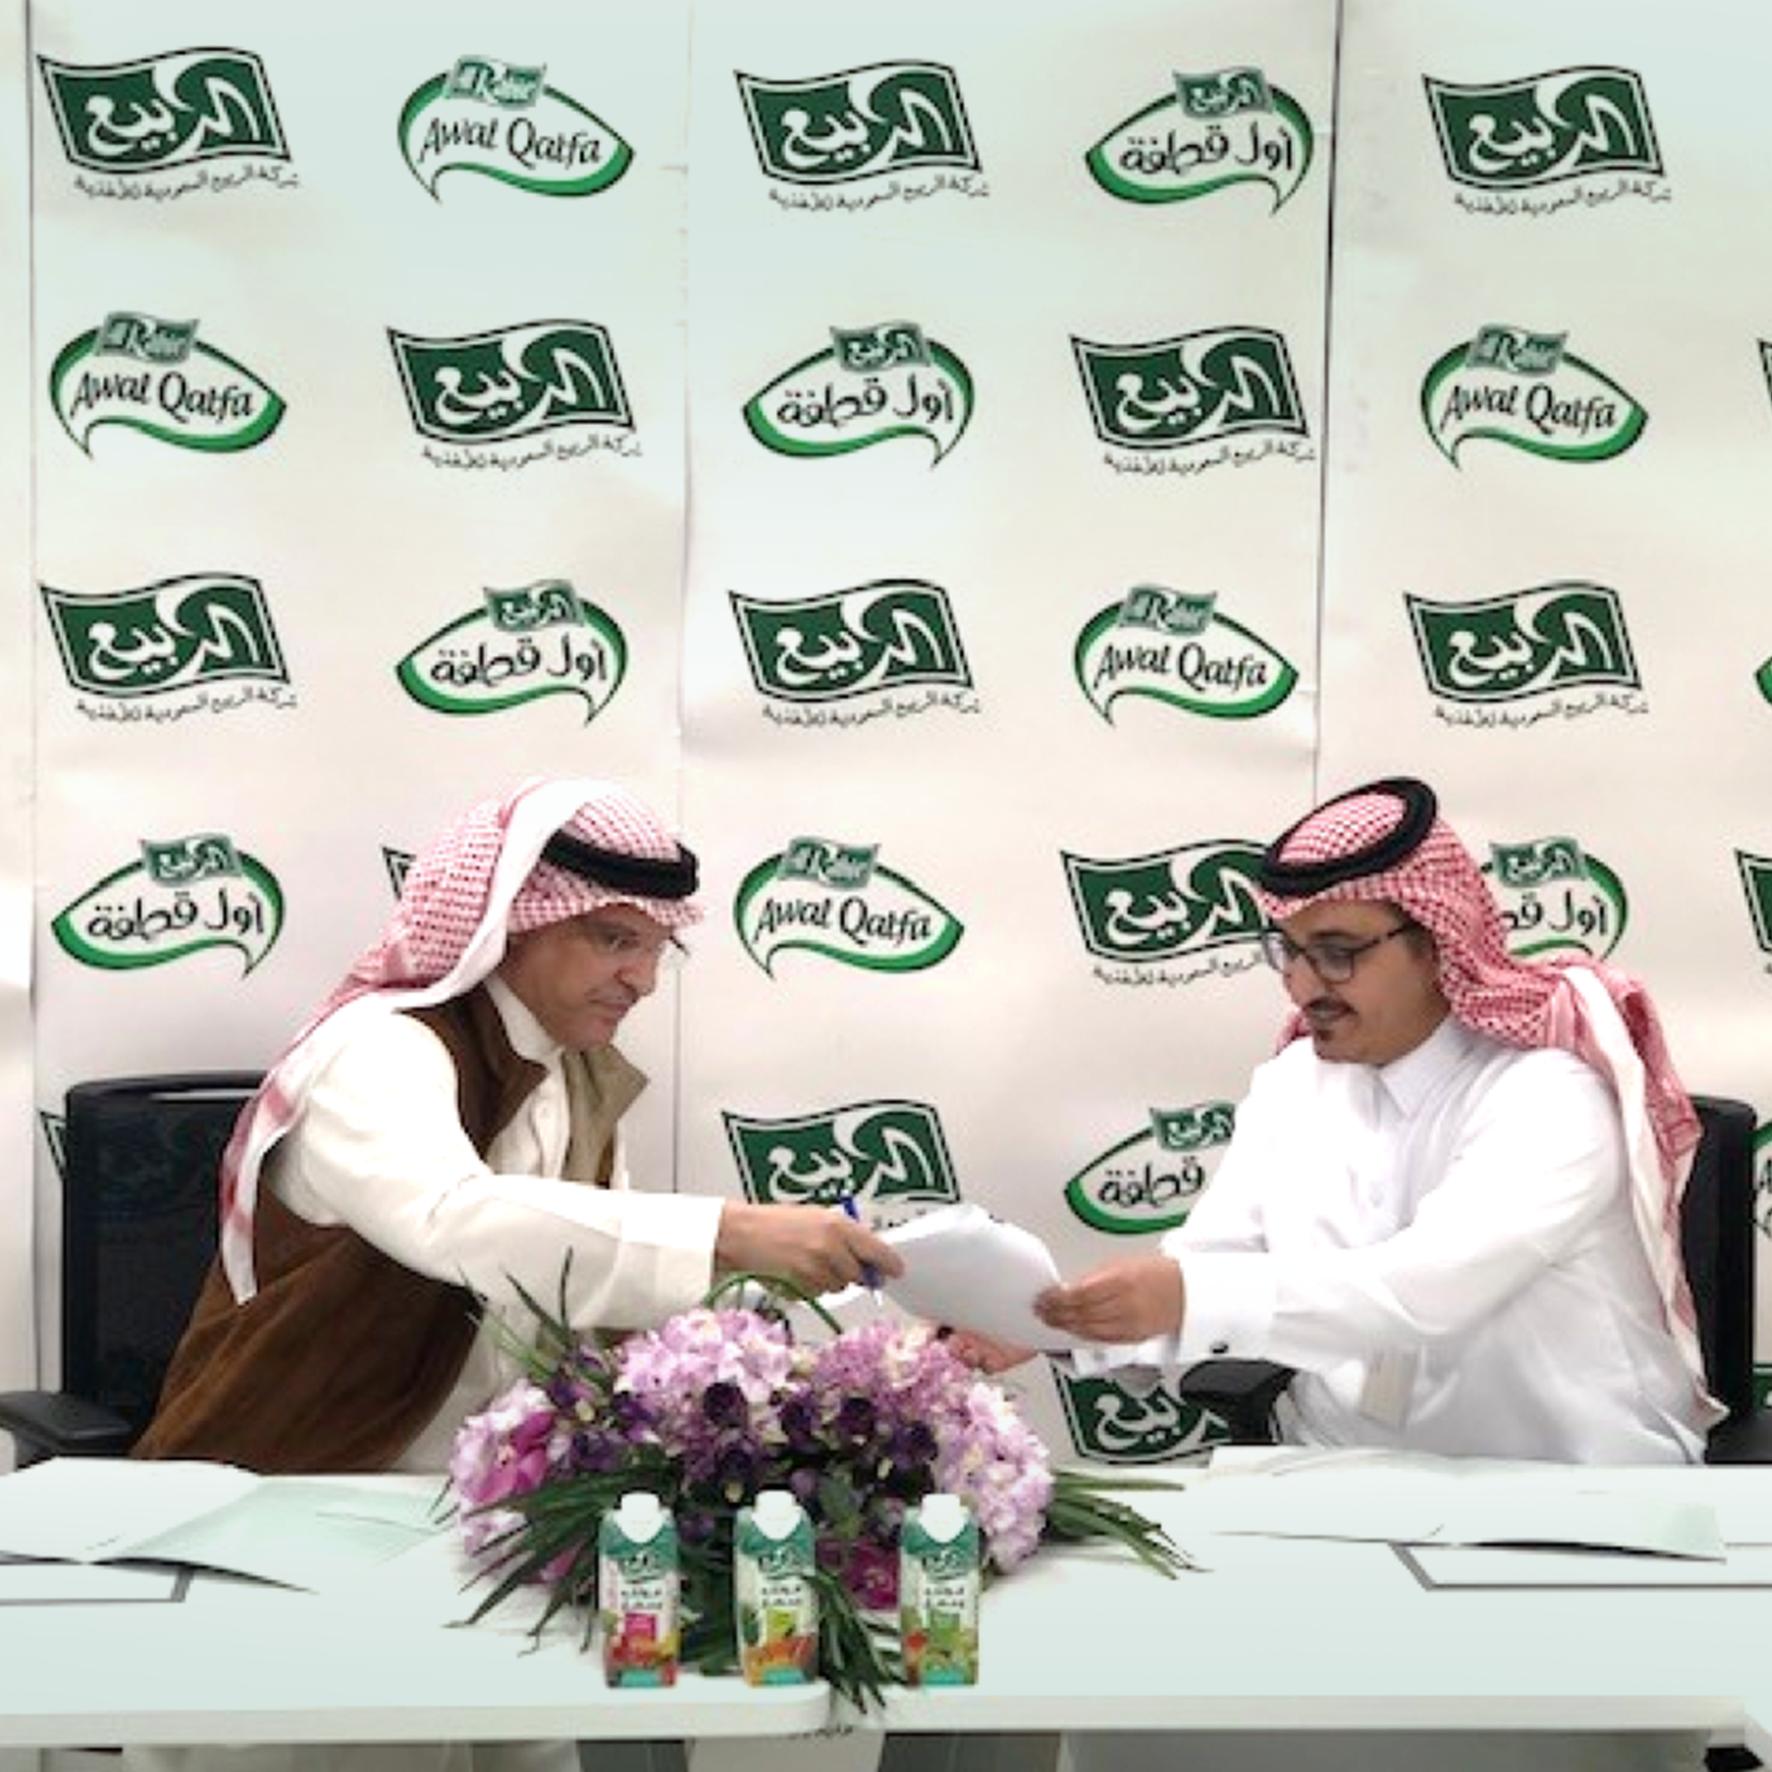 Al Rabie Saudi Foods Co. signs a Partnership Agreement with Saudi Food Bank (Etaam)